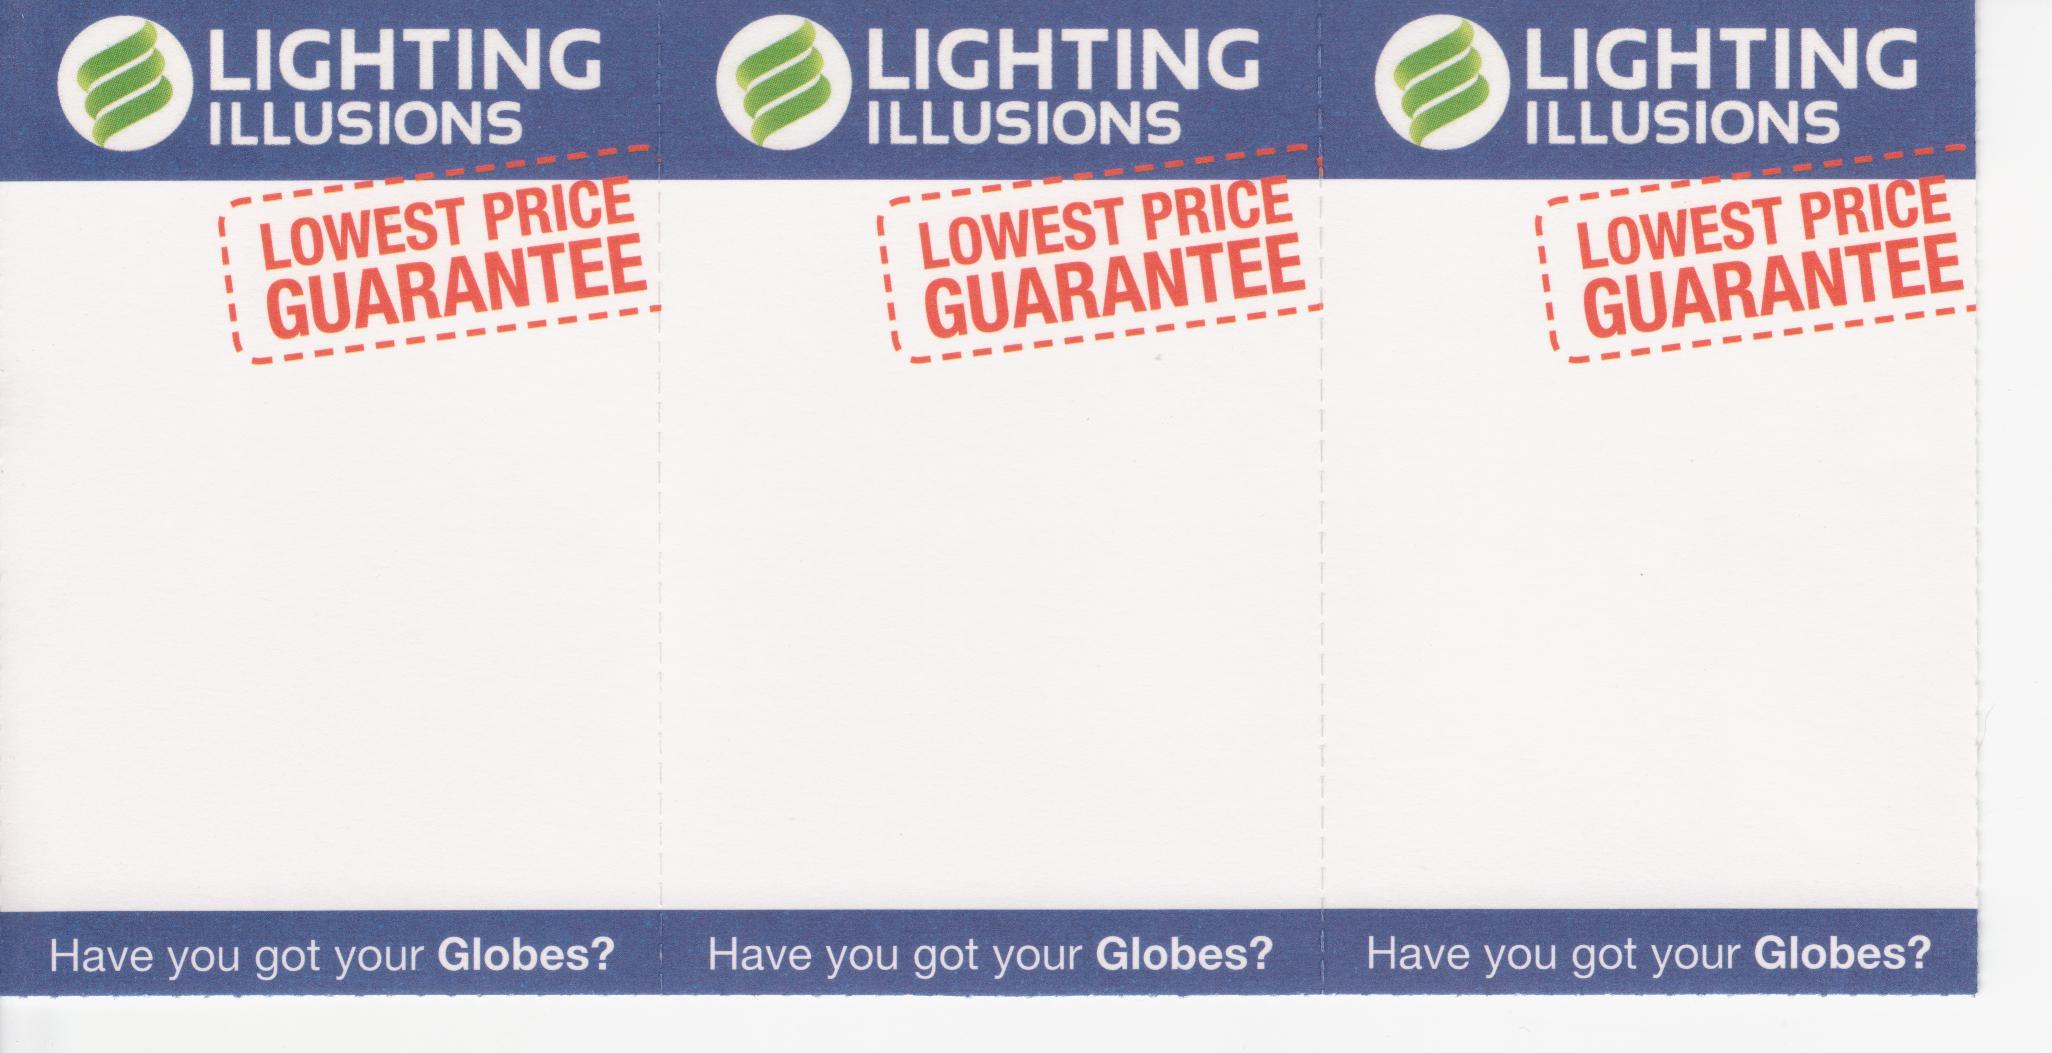 LightingIllusions_lowestpriceguarantee_b